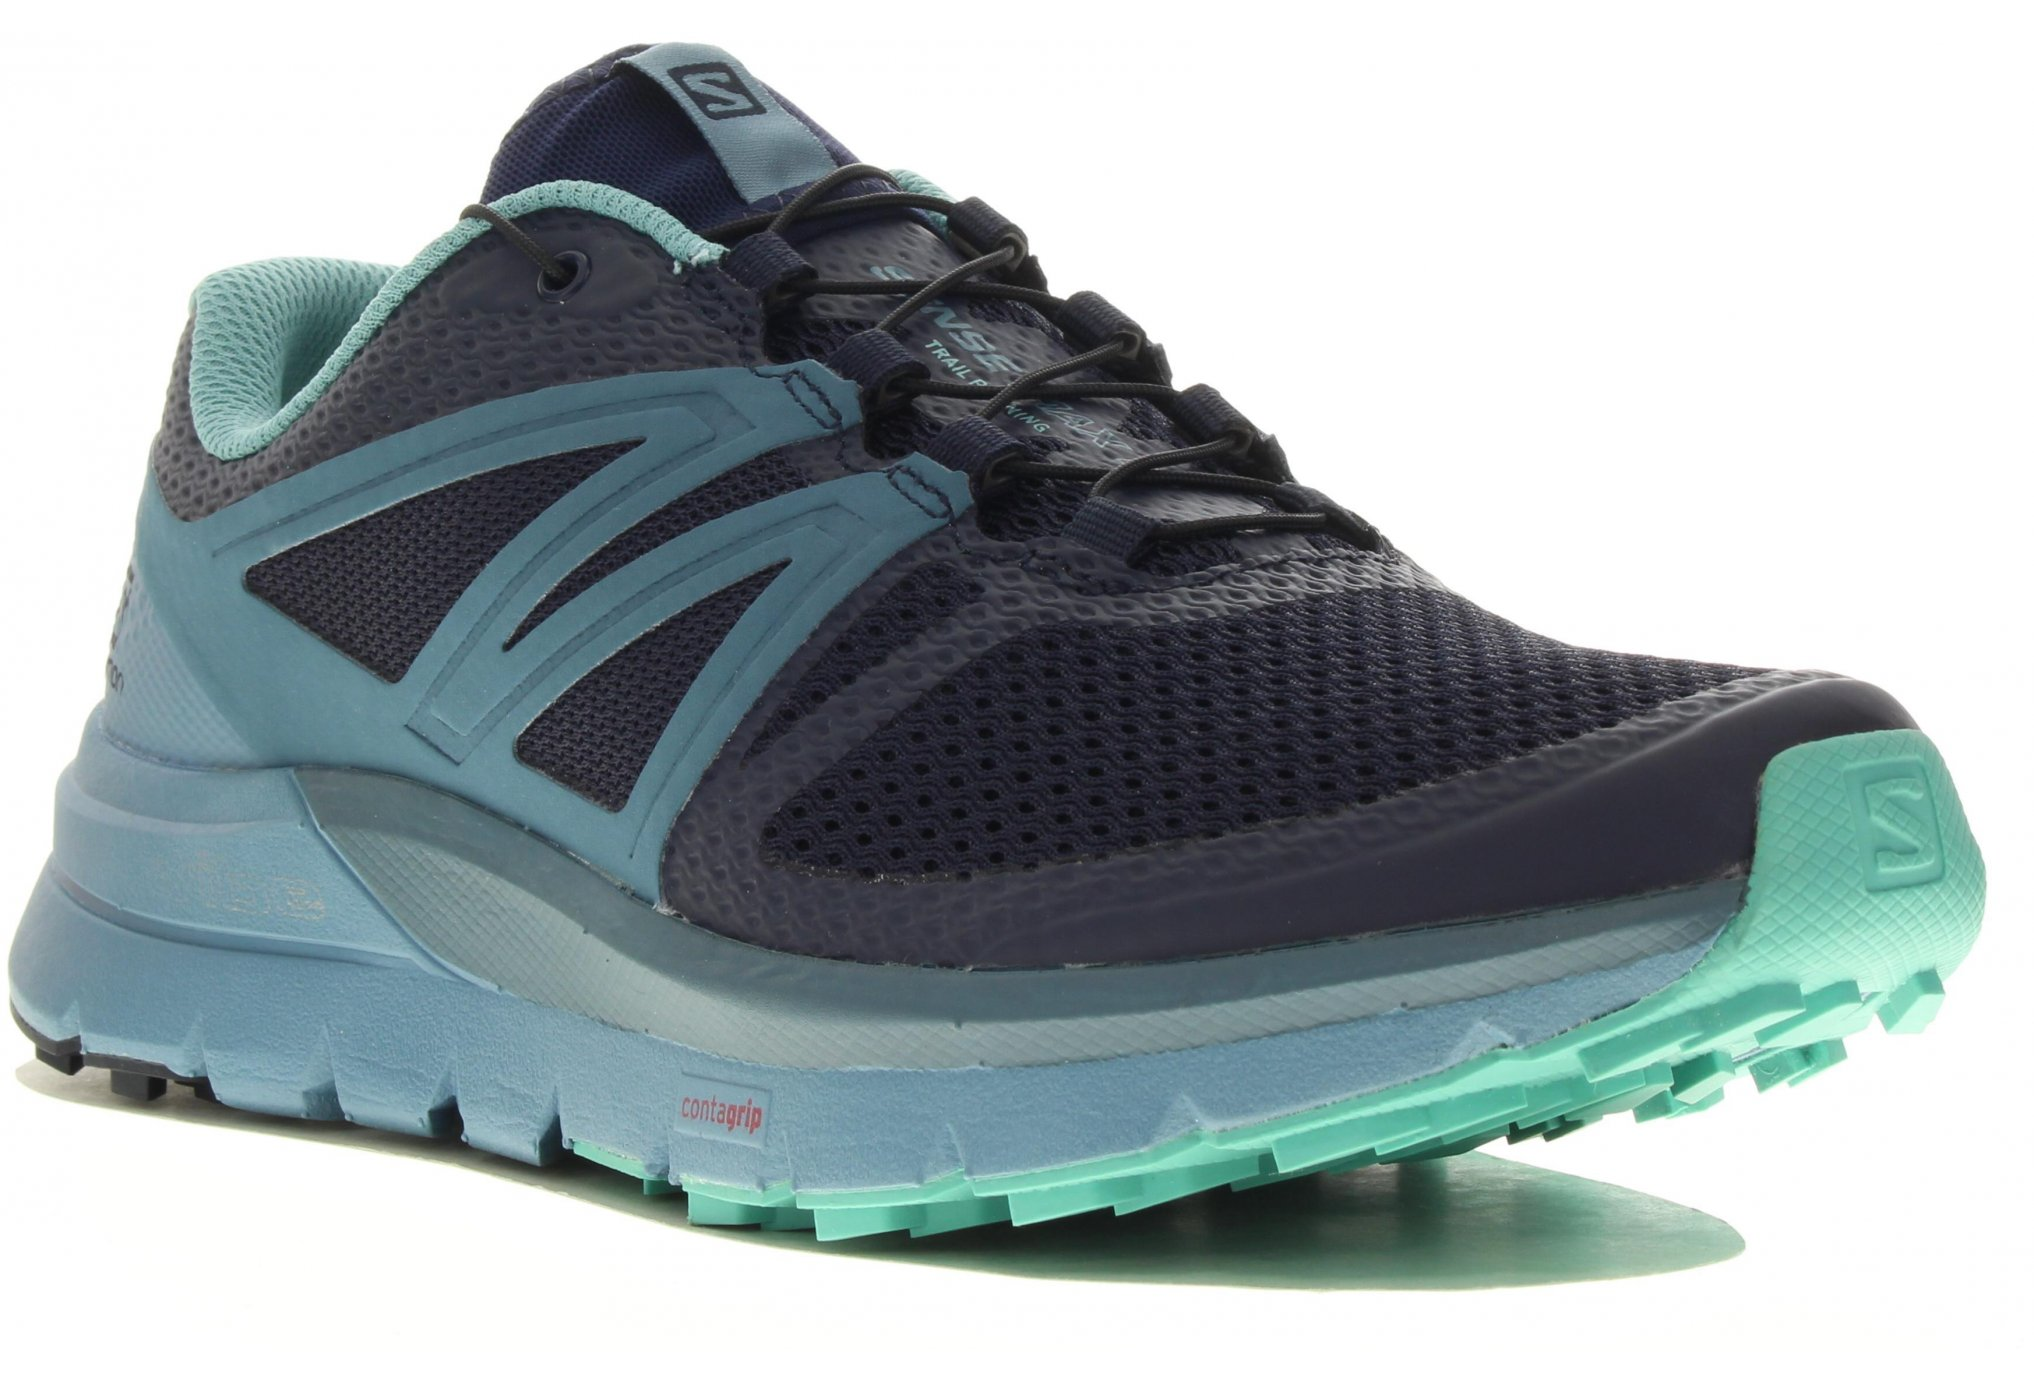 Salomon Sense Max 2 Chaussures running femme